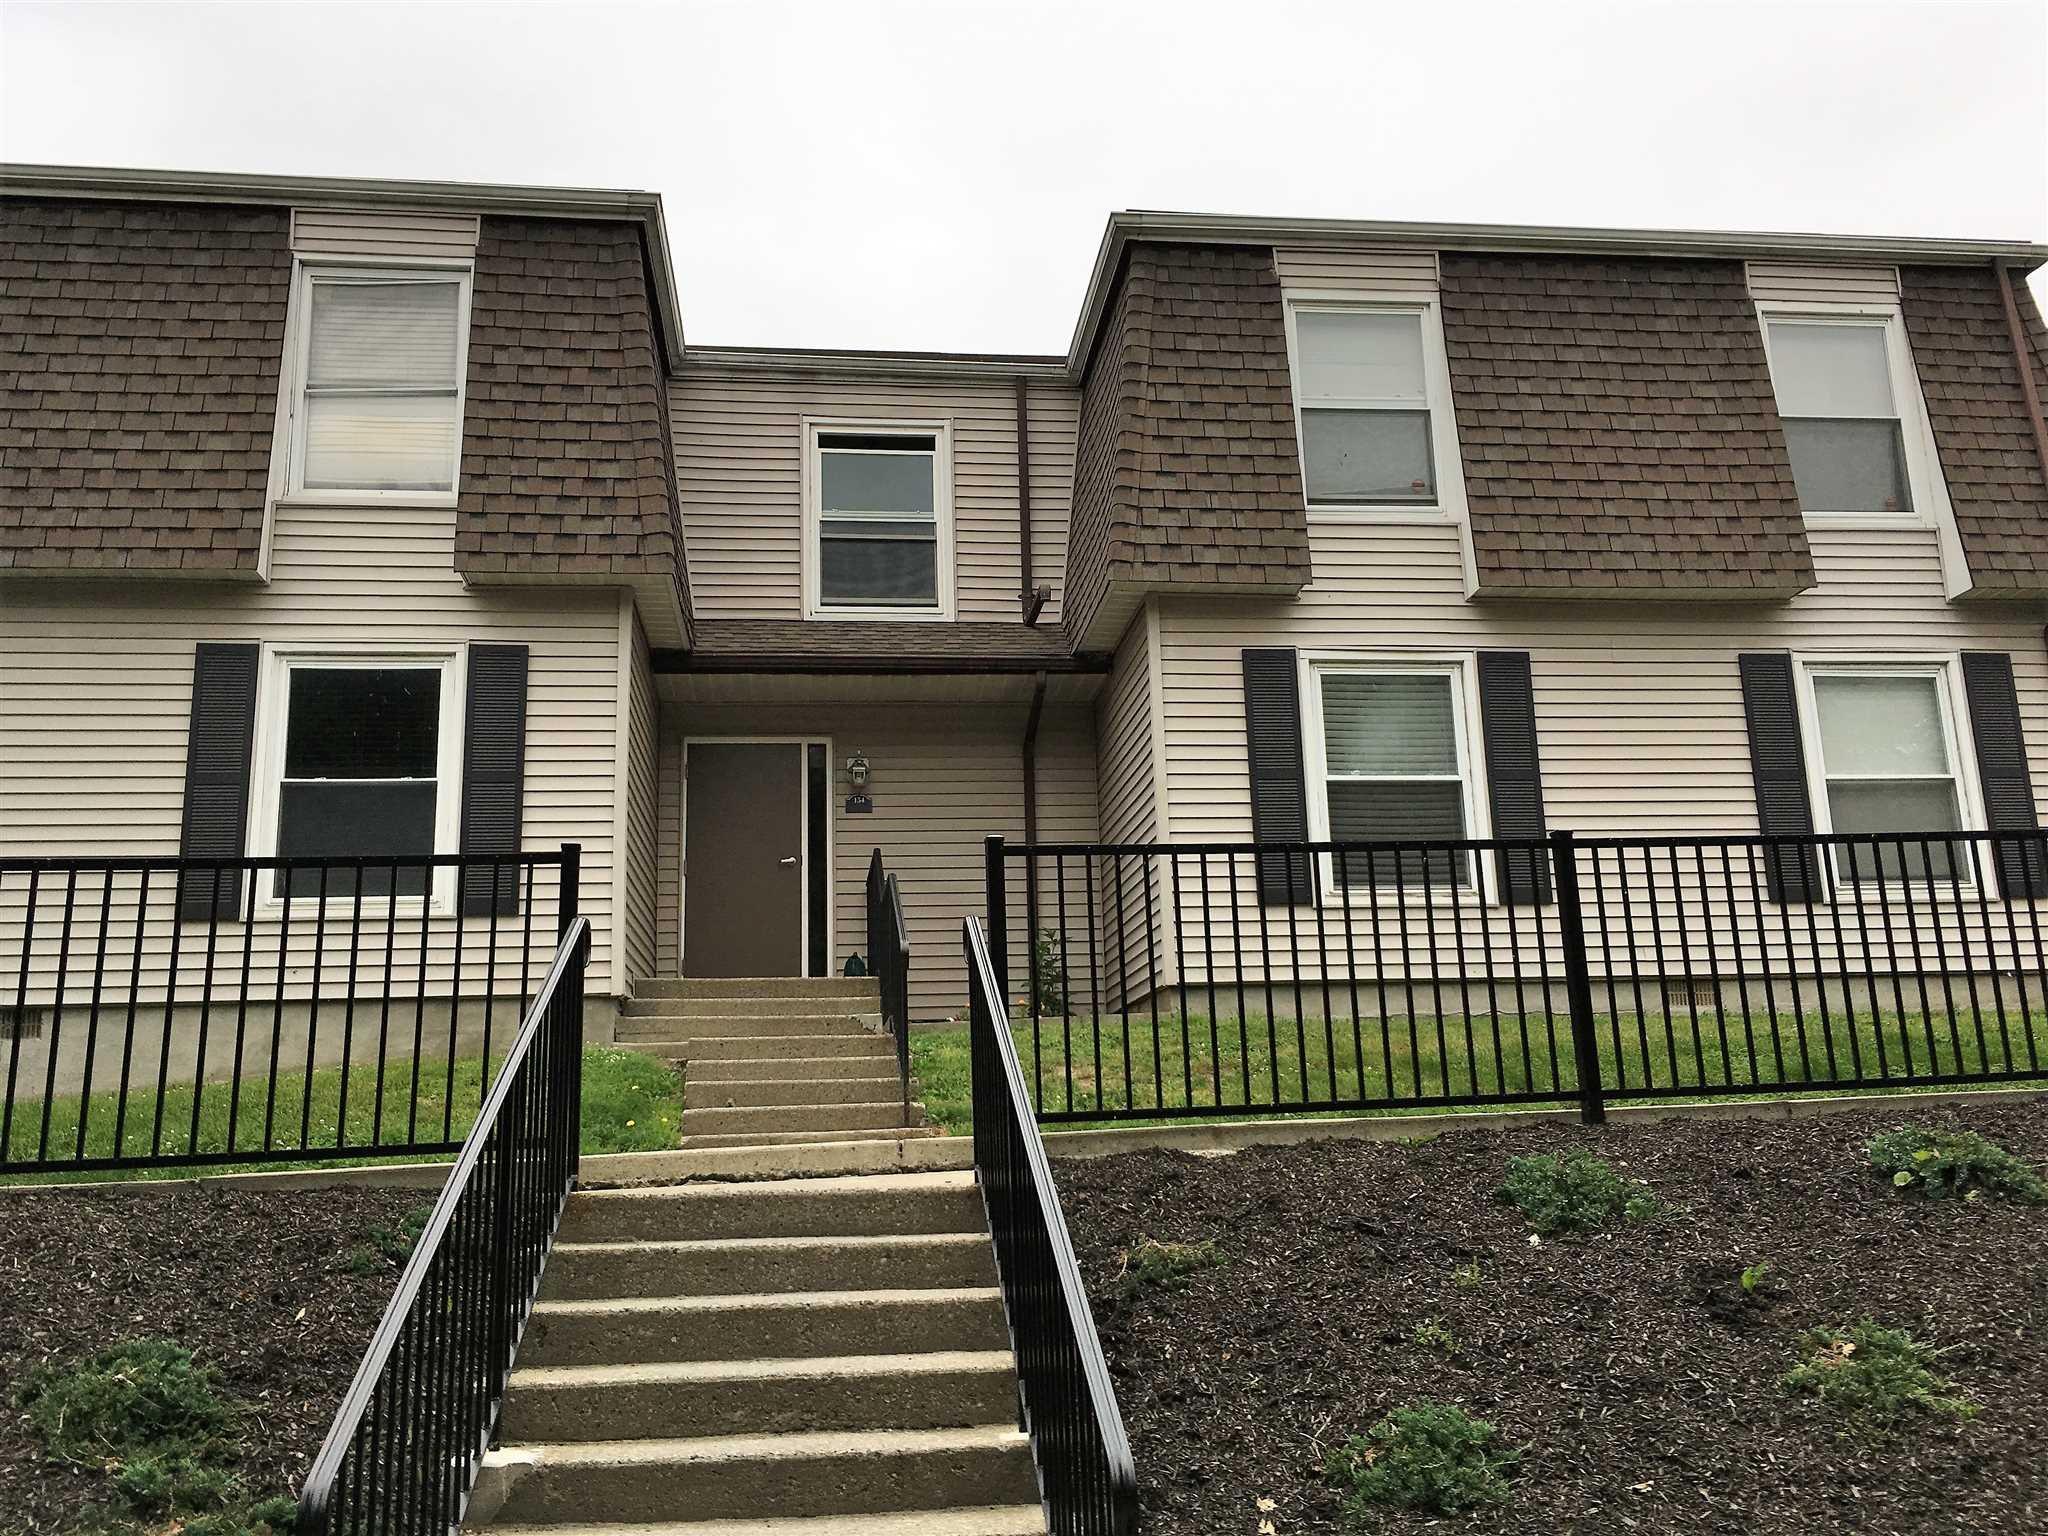 Single Family Home for Sale at 152 RINALDI 152 RINALDI Poughkeepsie, New York 12601 United States